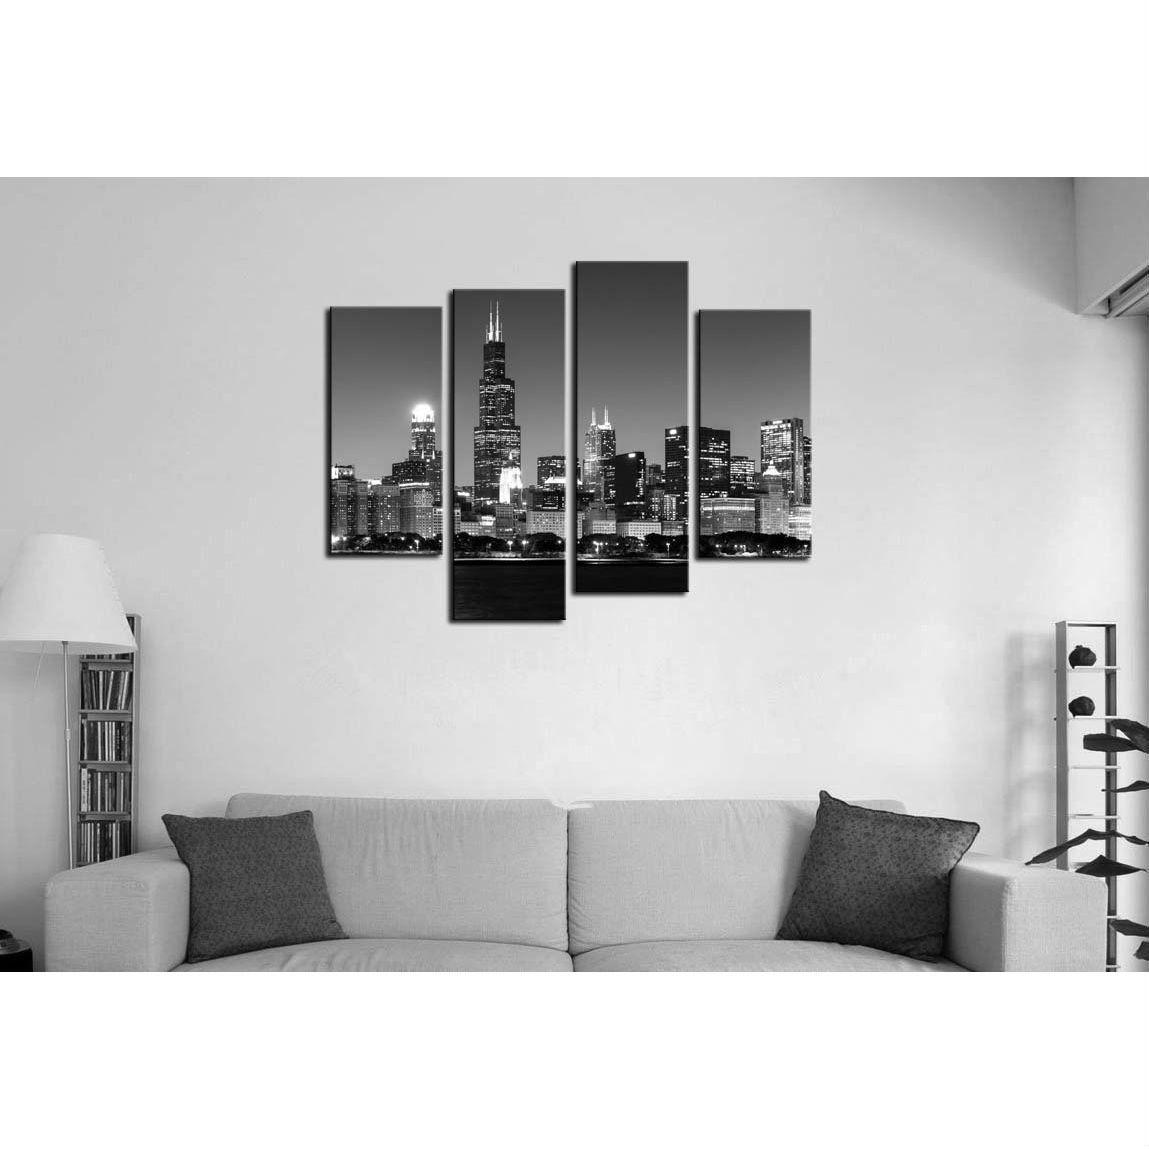 Chicago night skyline black white print panel canvas wall art